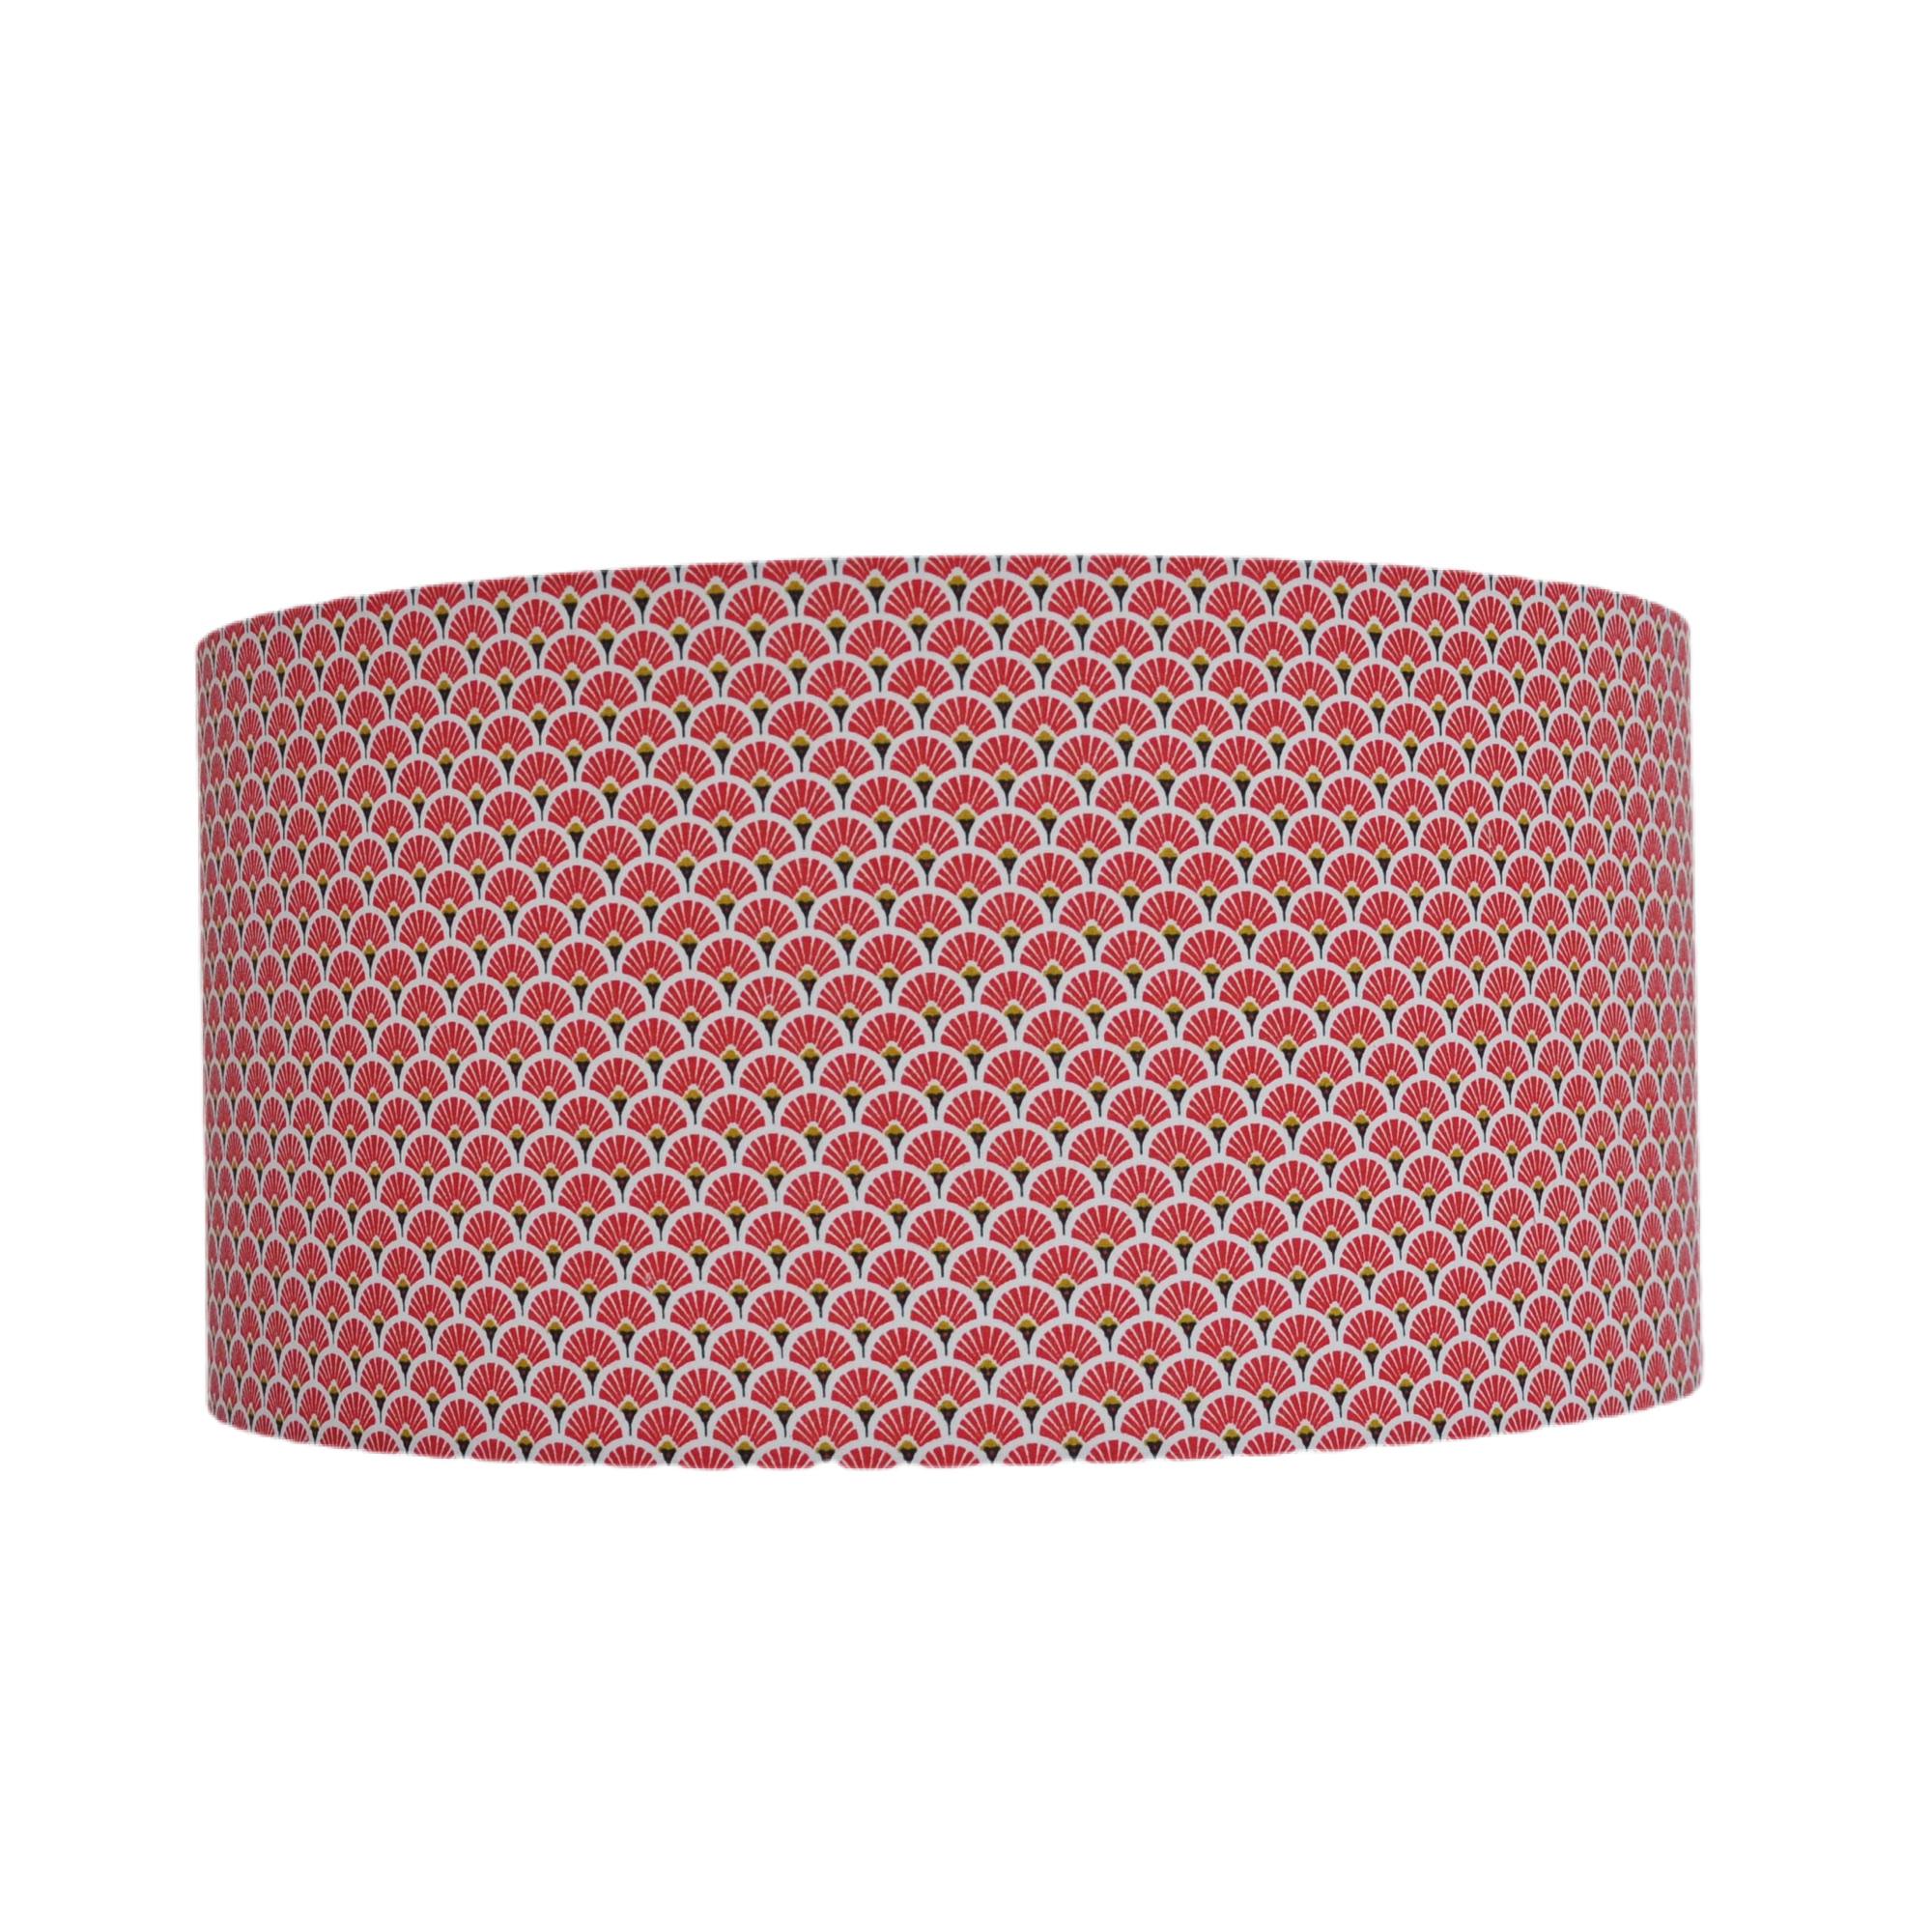 Suspension eventail rouge et or diamètre 35 cm